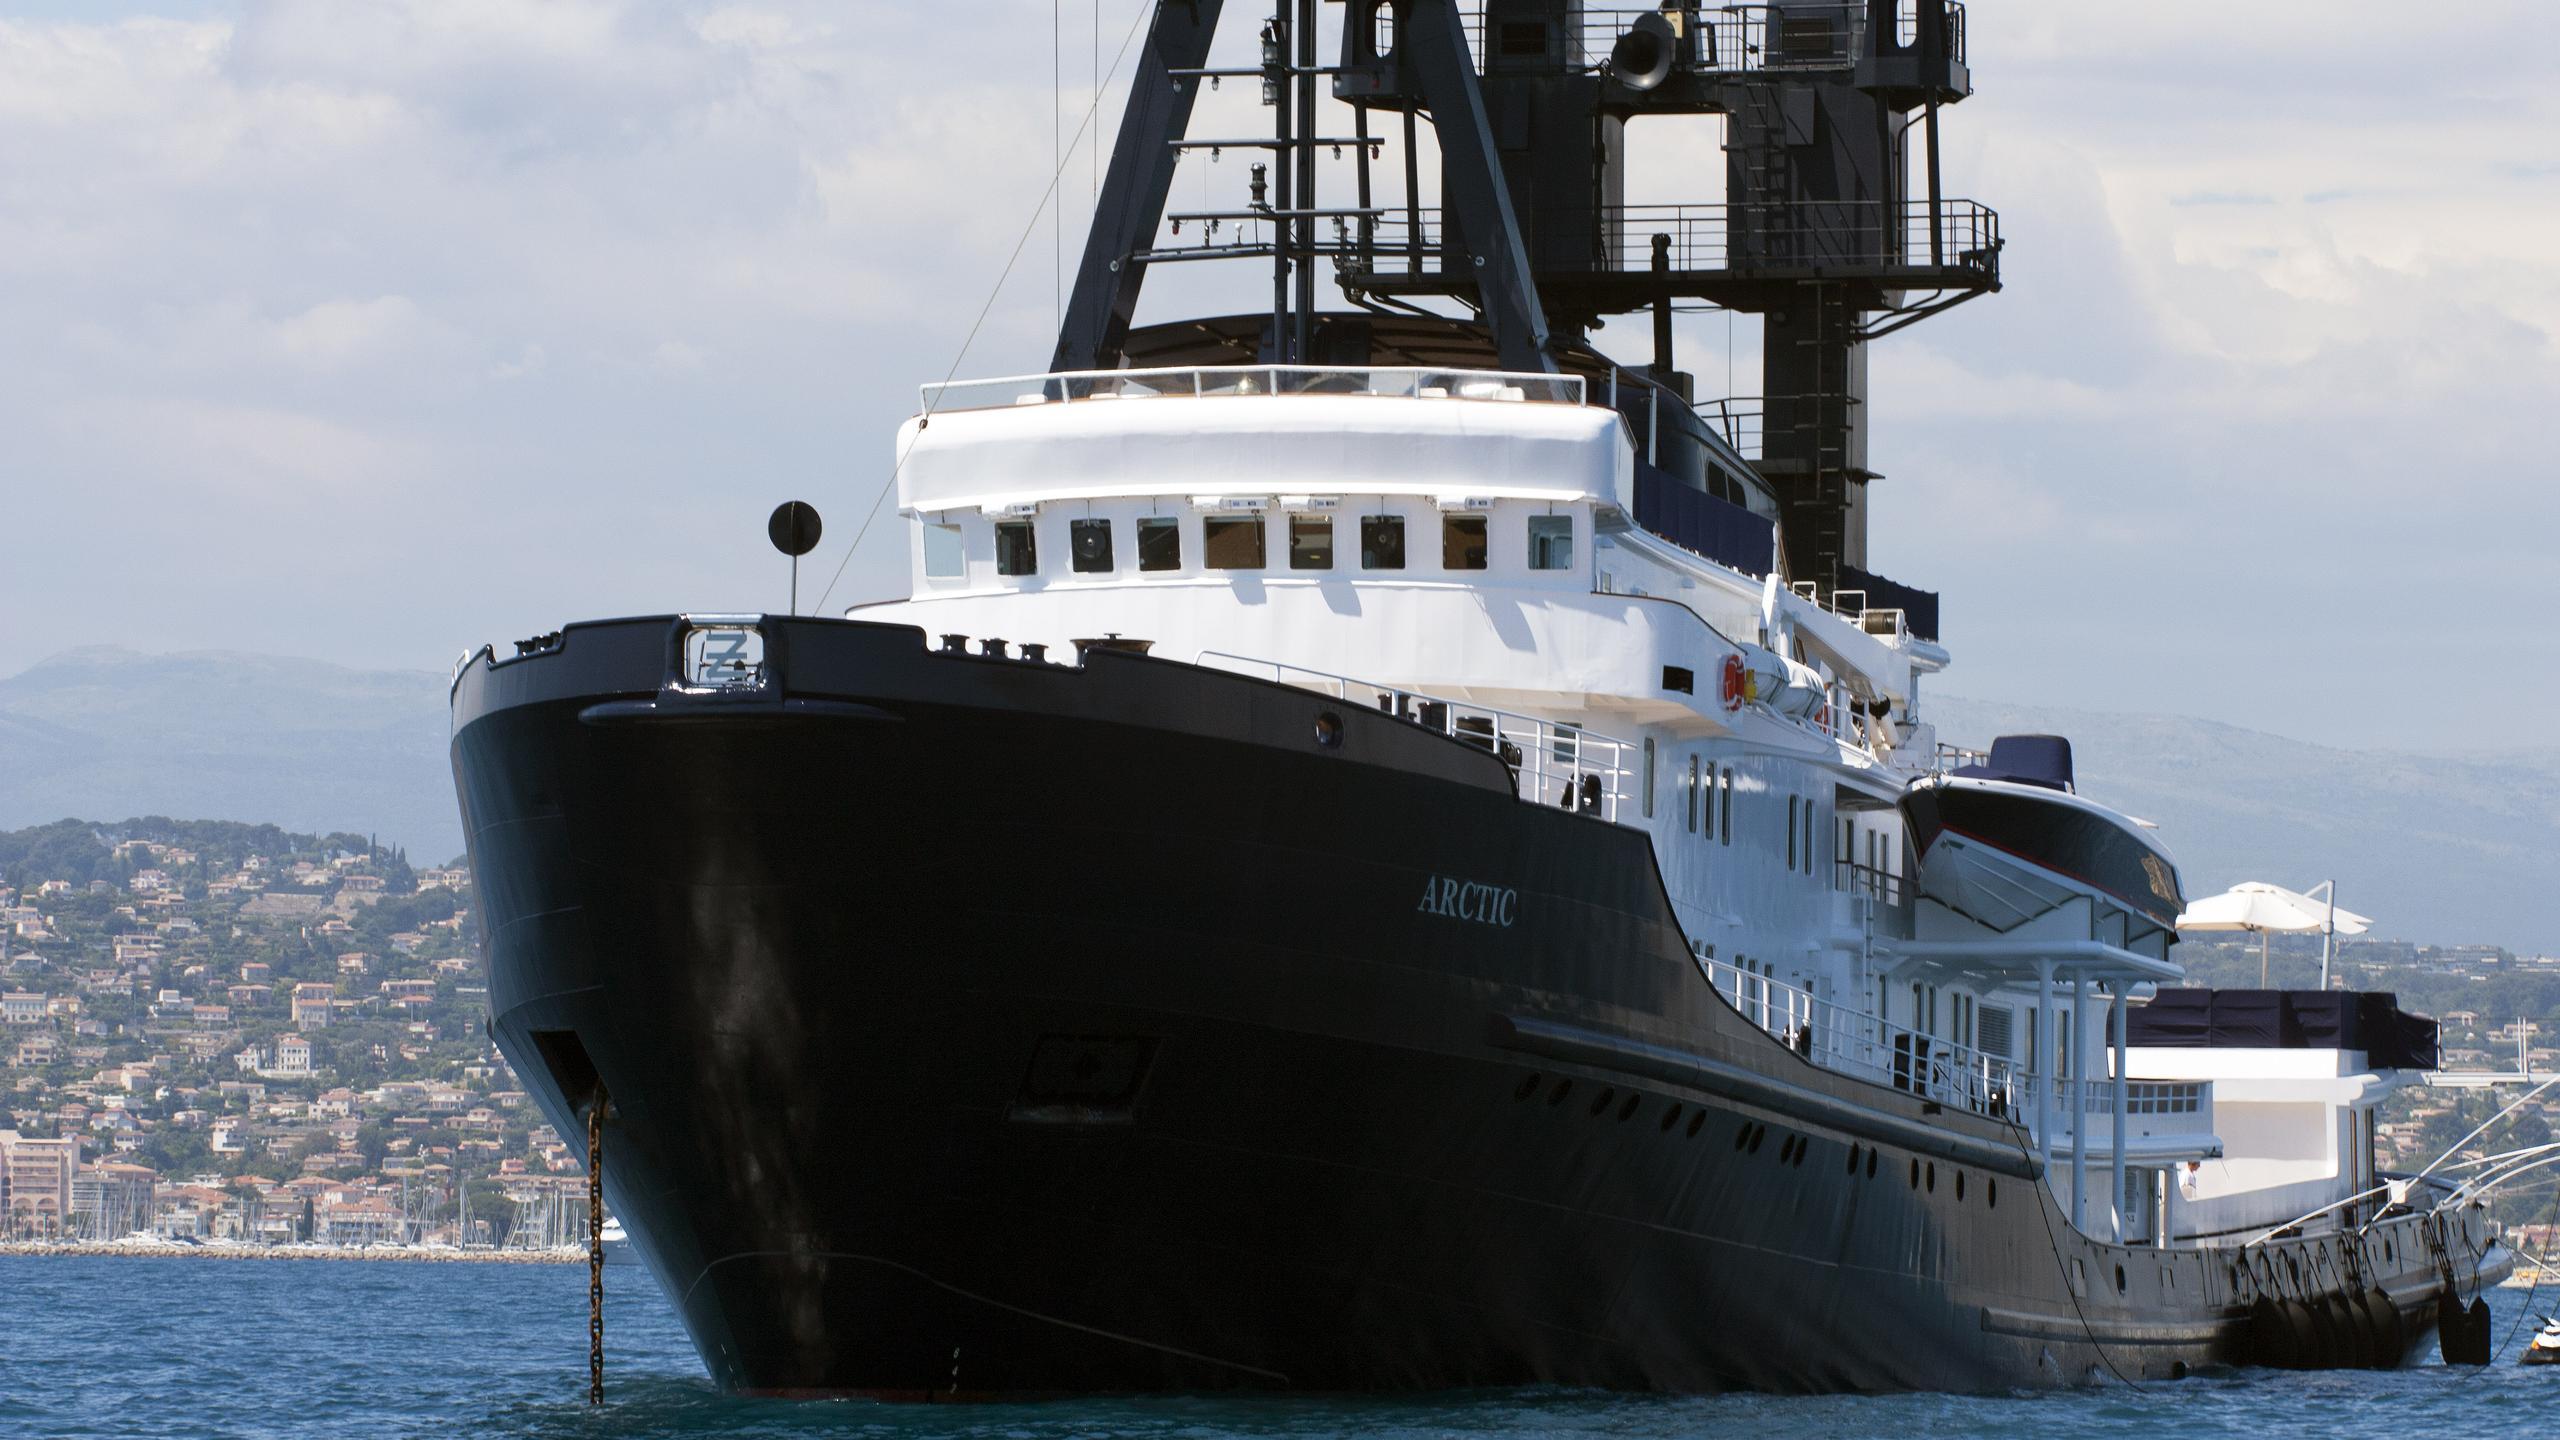 arctic-p-explorer-yacht-schichau-unterweser-1969-88m-bow-details